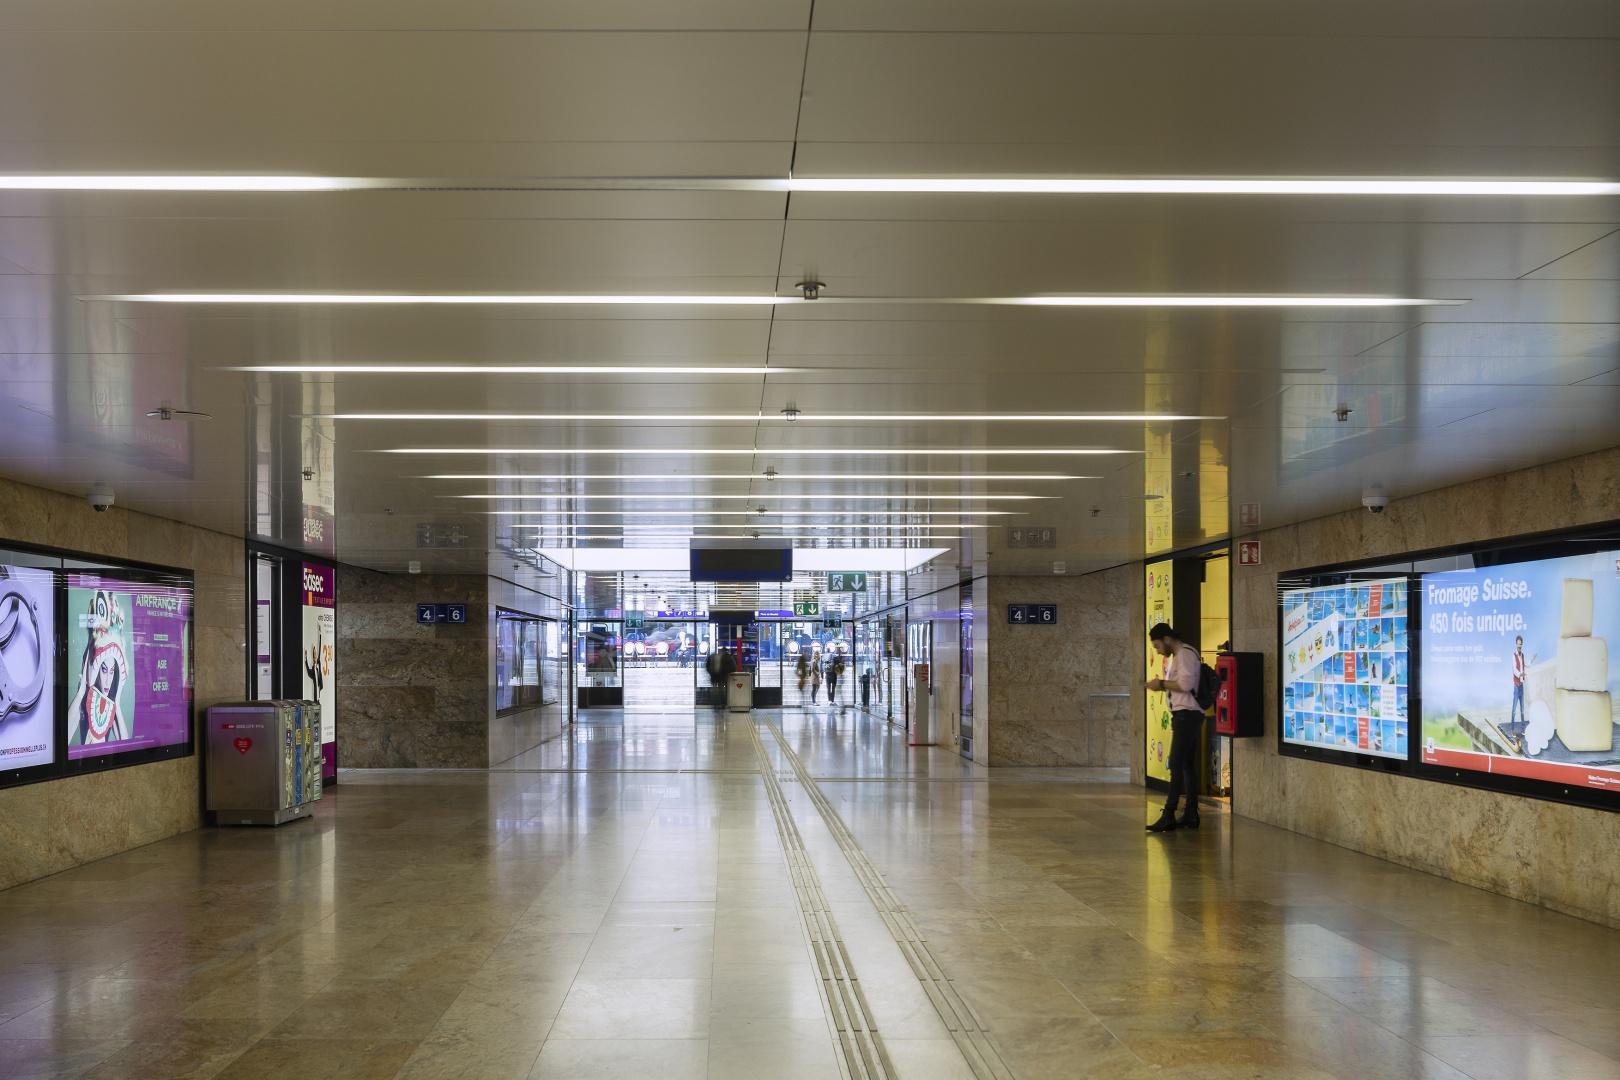 Circulation - Passage inférieur Est © Fernando Guerra, Lisbonne